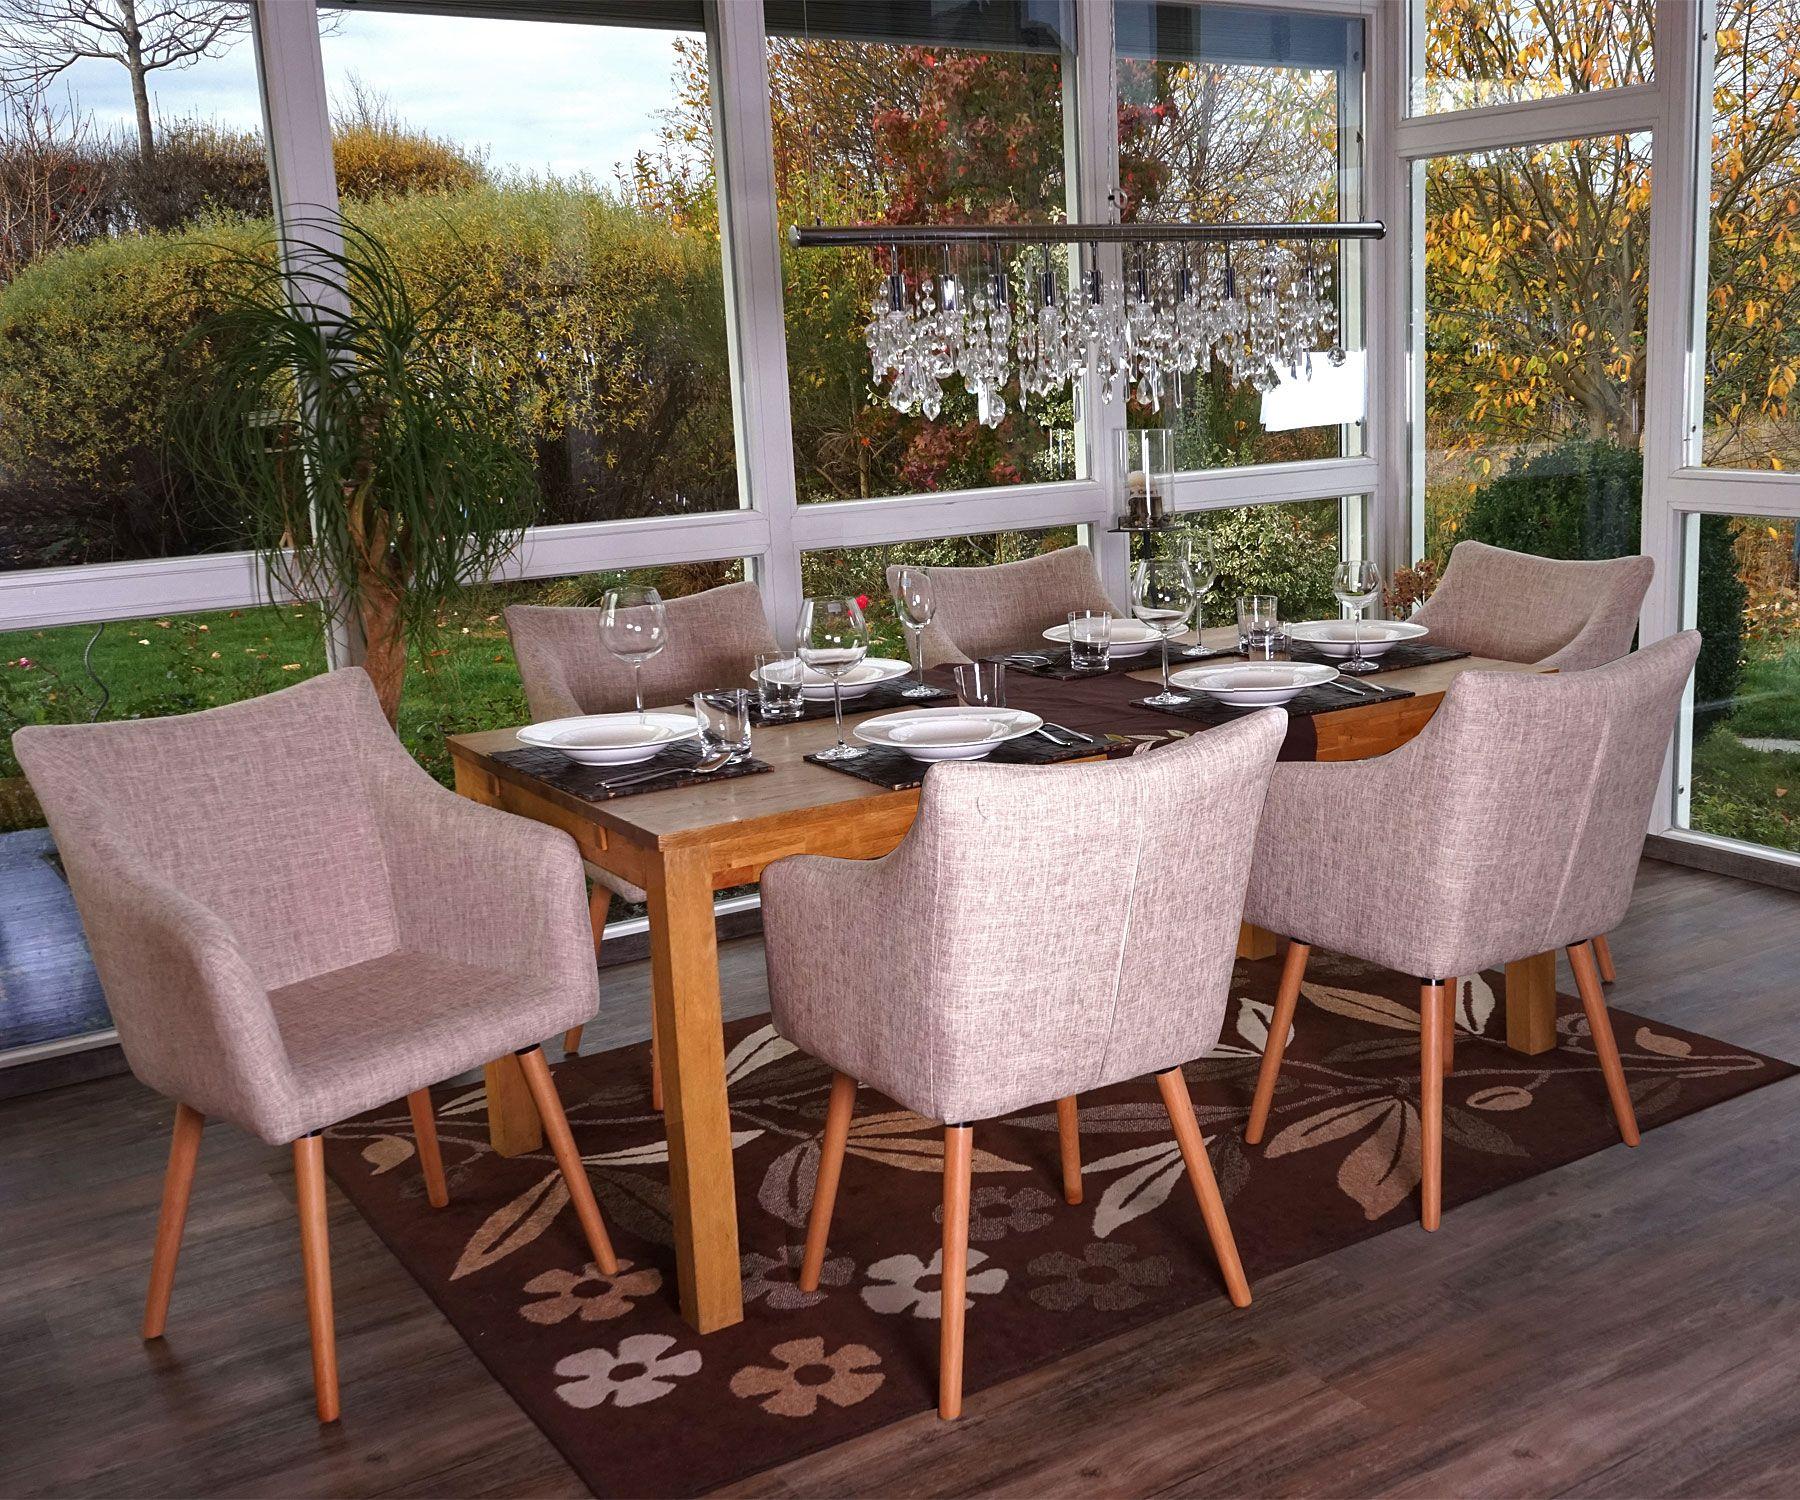 6x Esszimmerstuhl Malma T382 Stuhl Ka Chenstuhl Retro 50er Jahre Design Textil Creme Grau Stuhl Kunstleder Design Stuhle